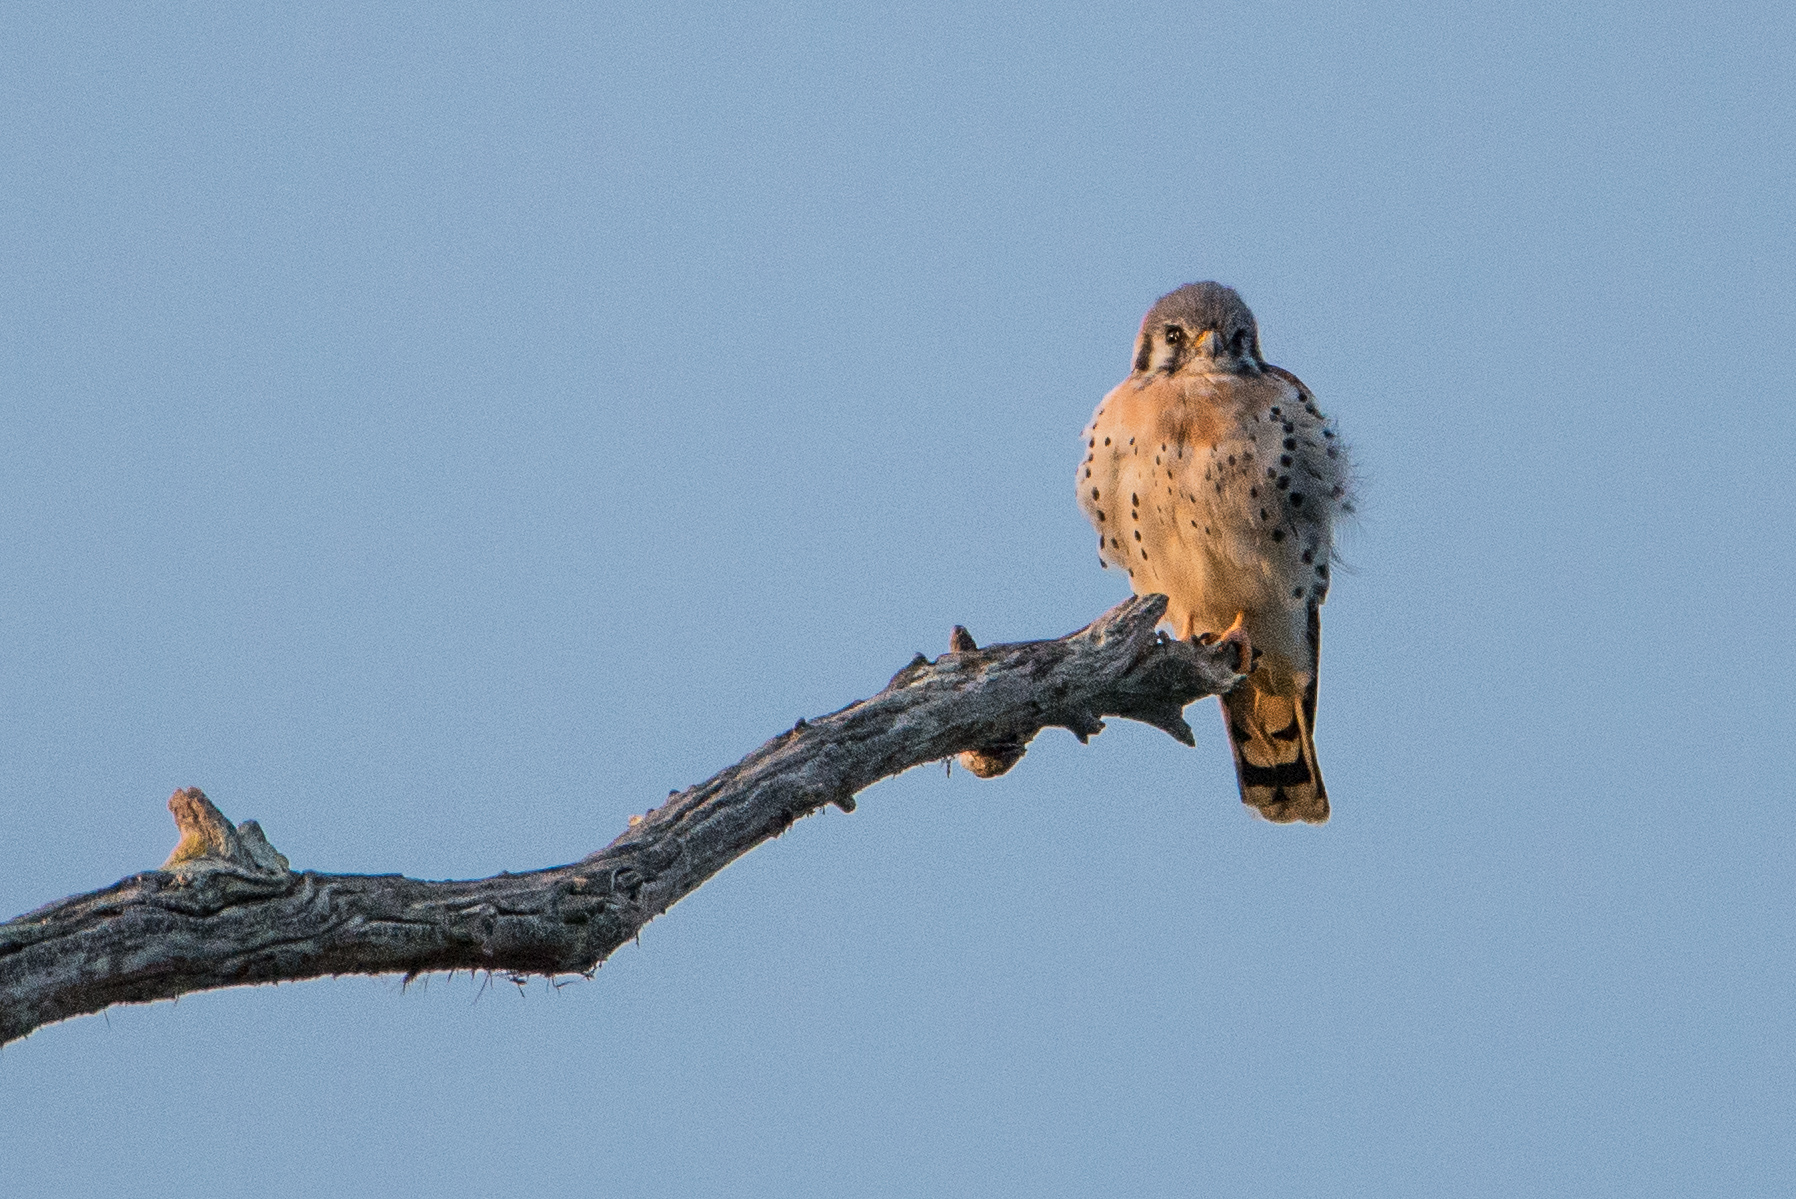 #bird, #wildlife, #florida, #audobon, #photography